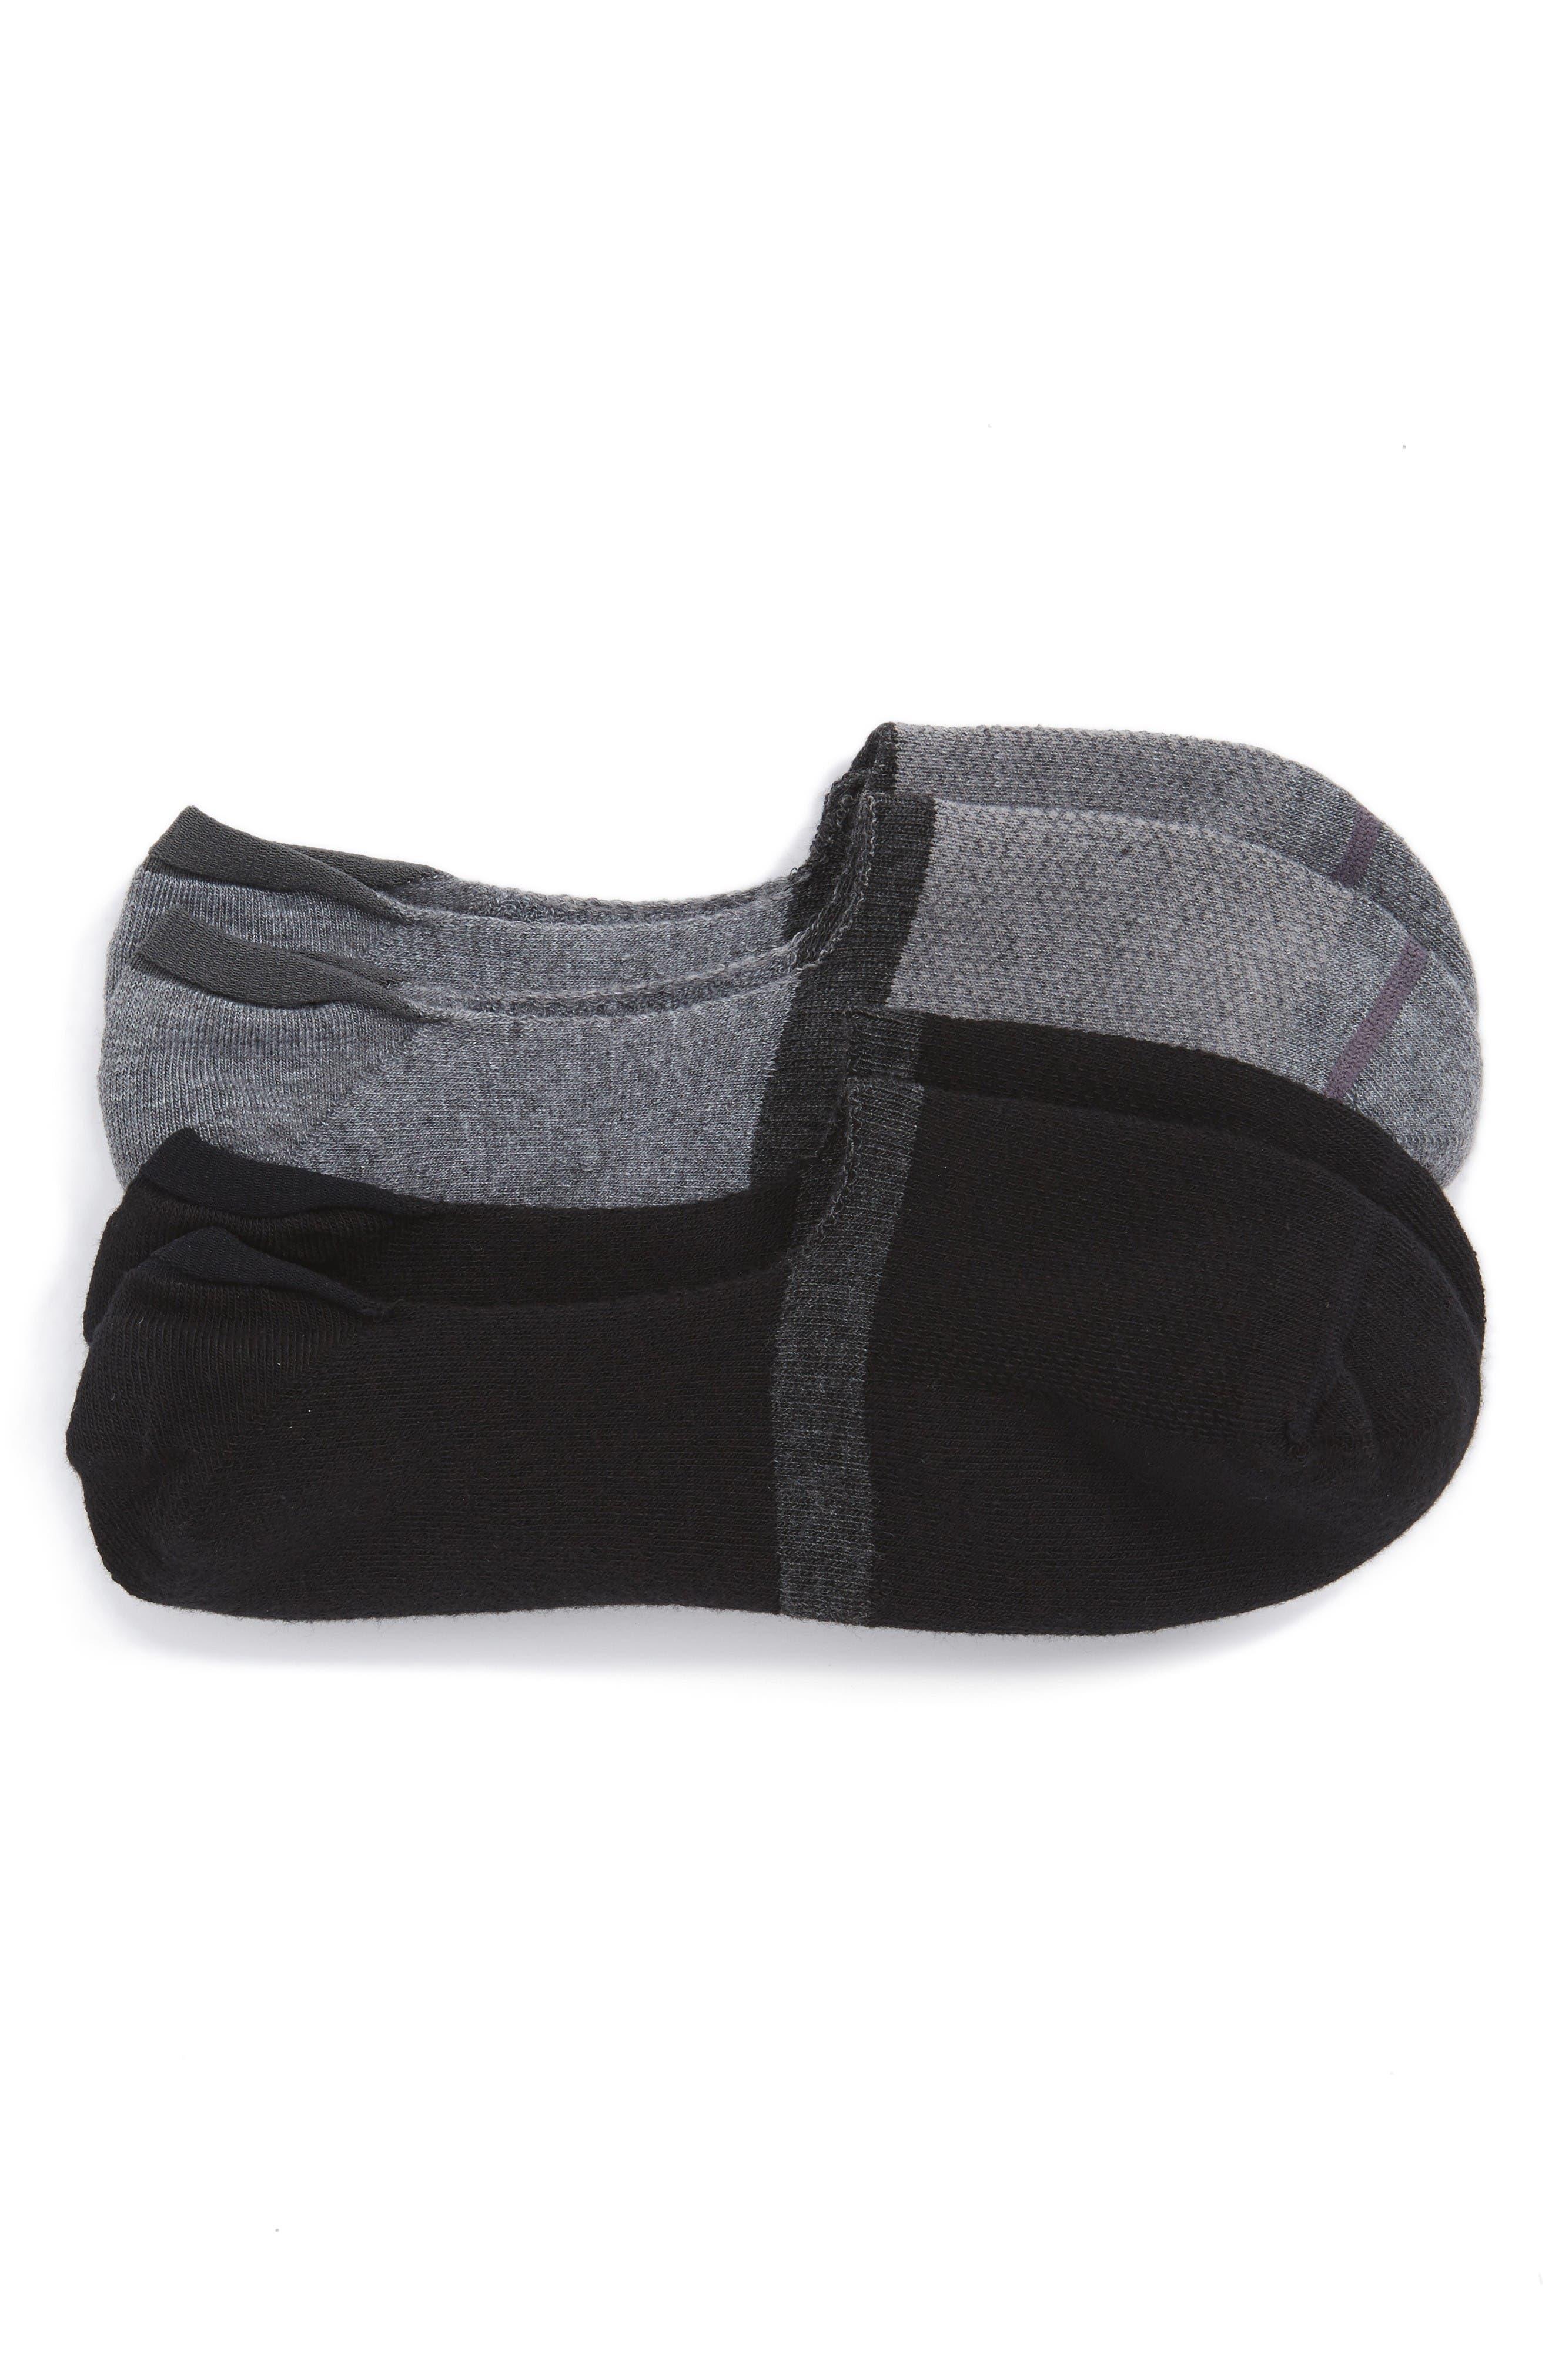 Nordstrom Men's Shop 2-Pack Performance Liner Socks (3 for $30)